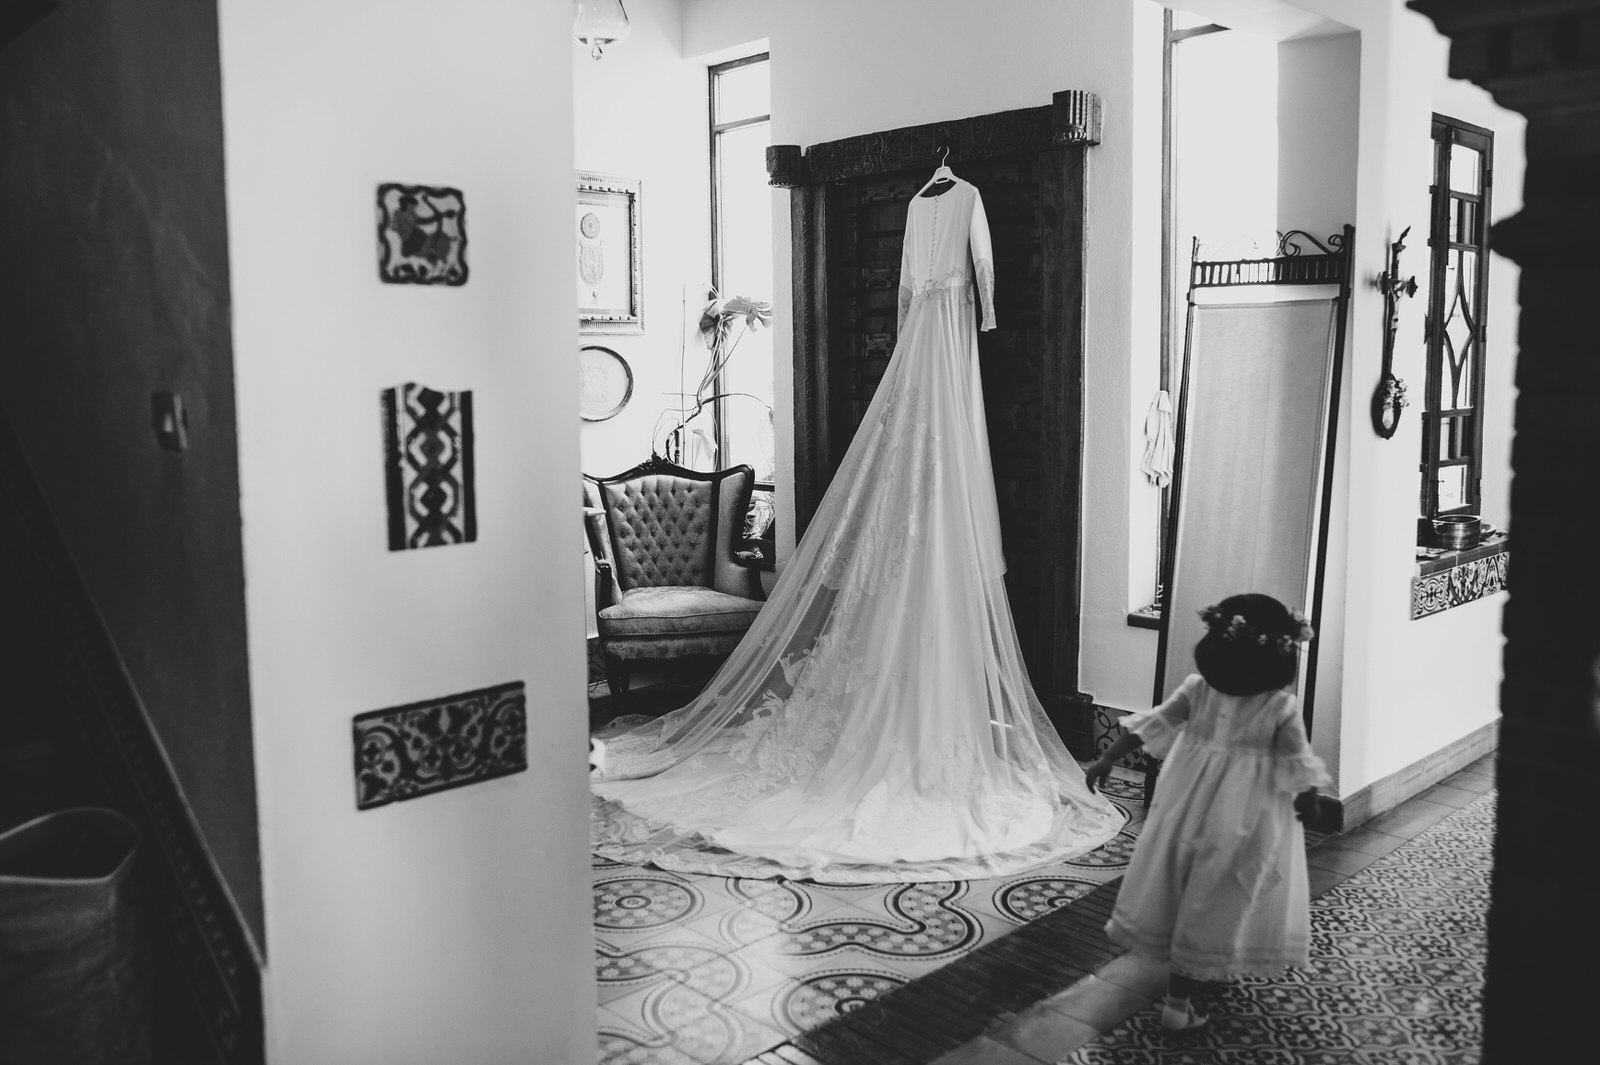 Judith & Gabriel - Boda en Olivares - Albaida, Fotógrafo de boda Andrés Amarillo - 4.JPG